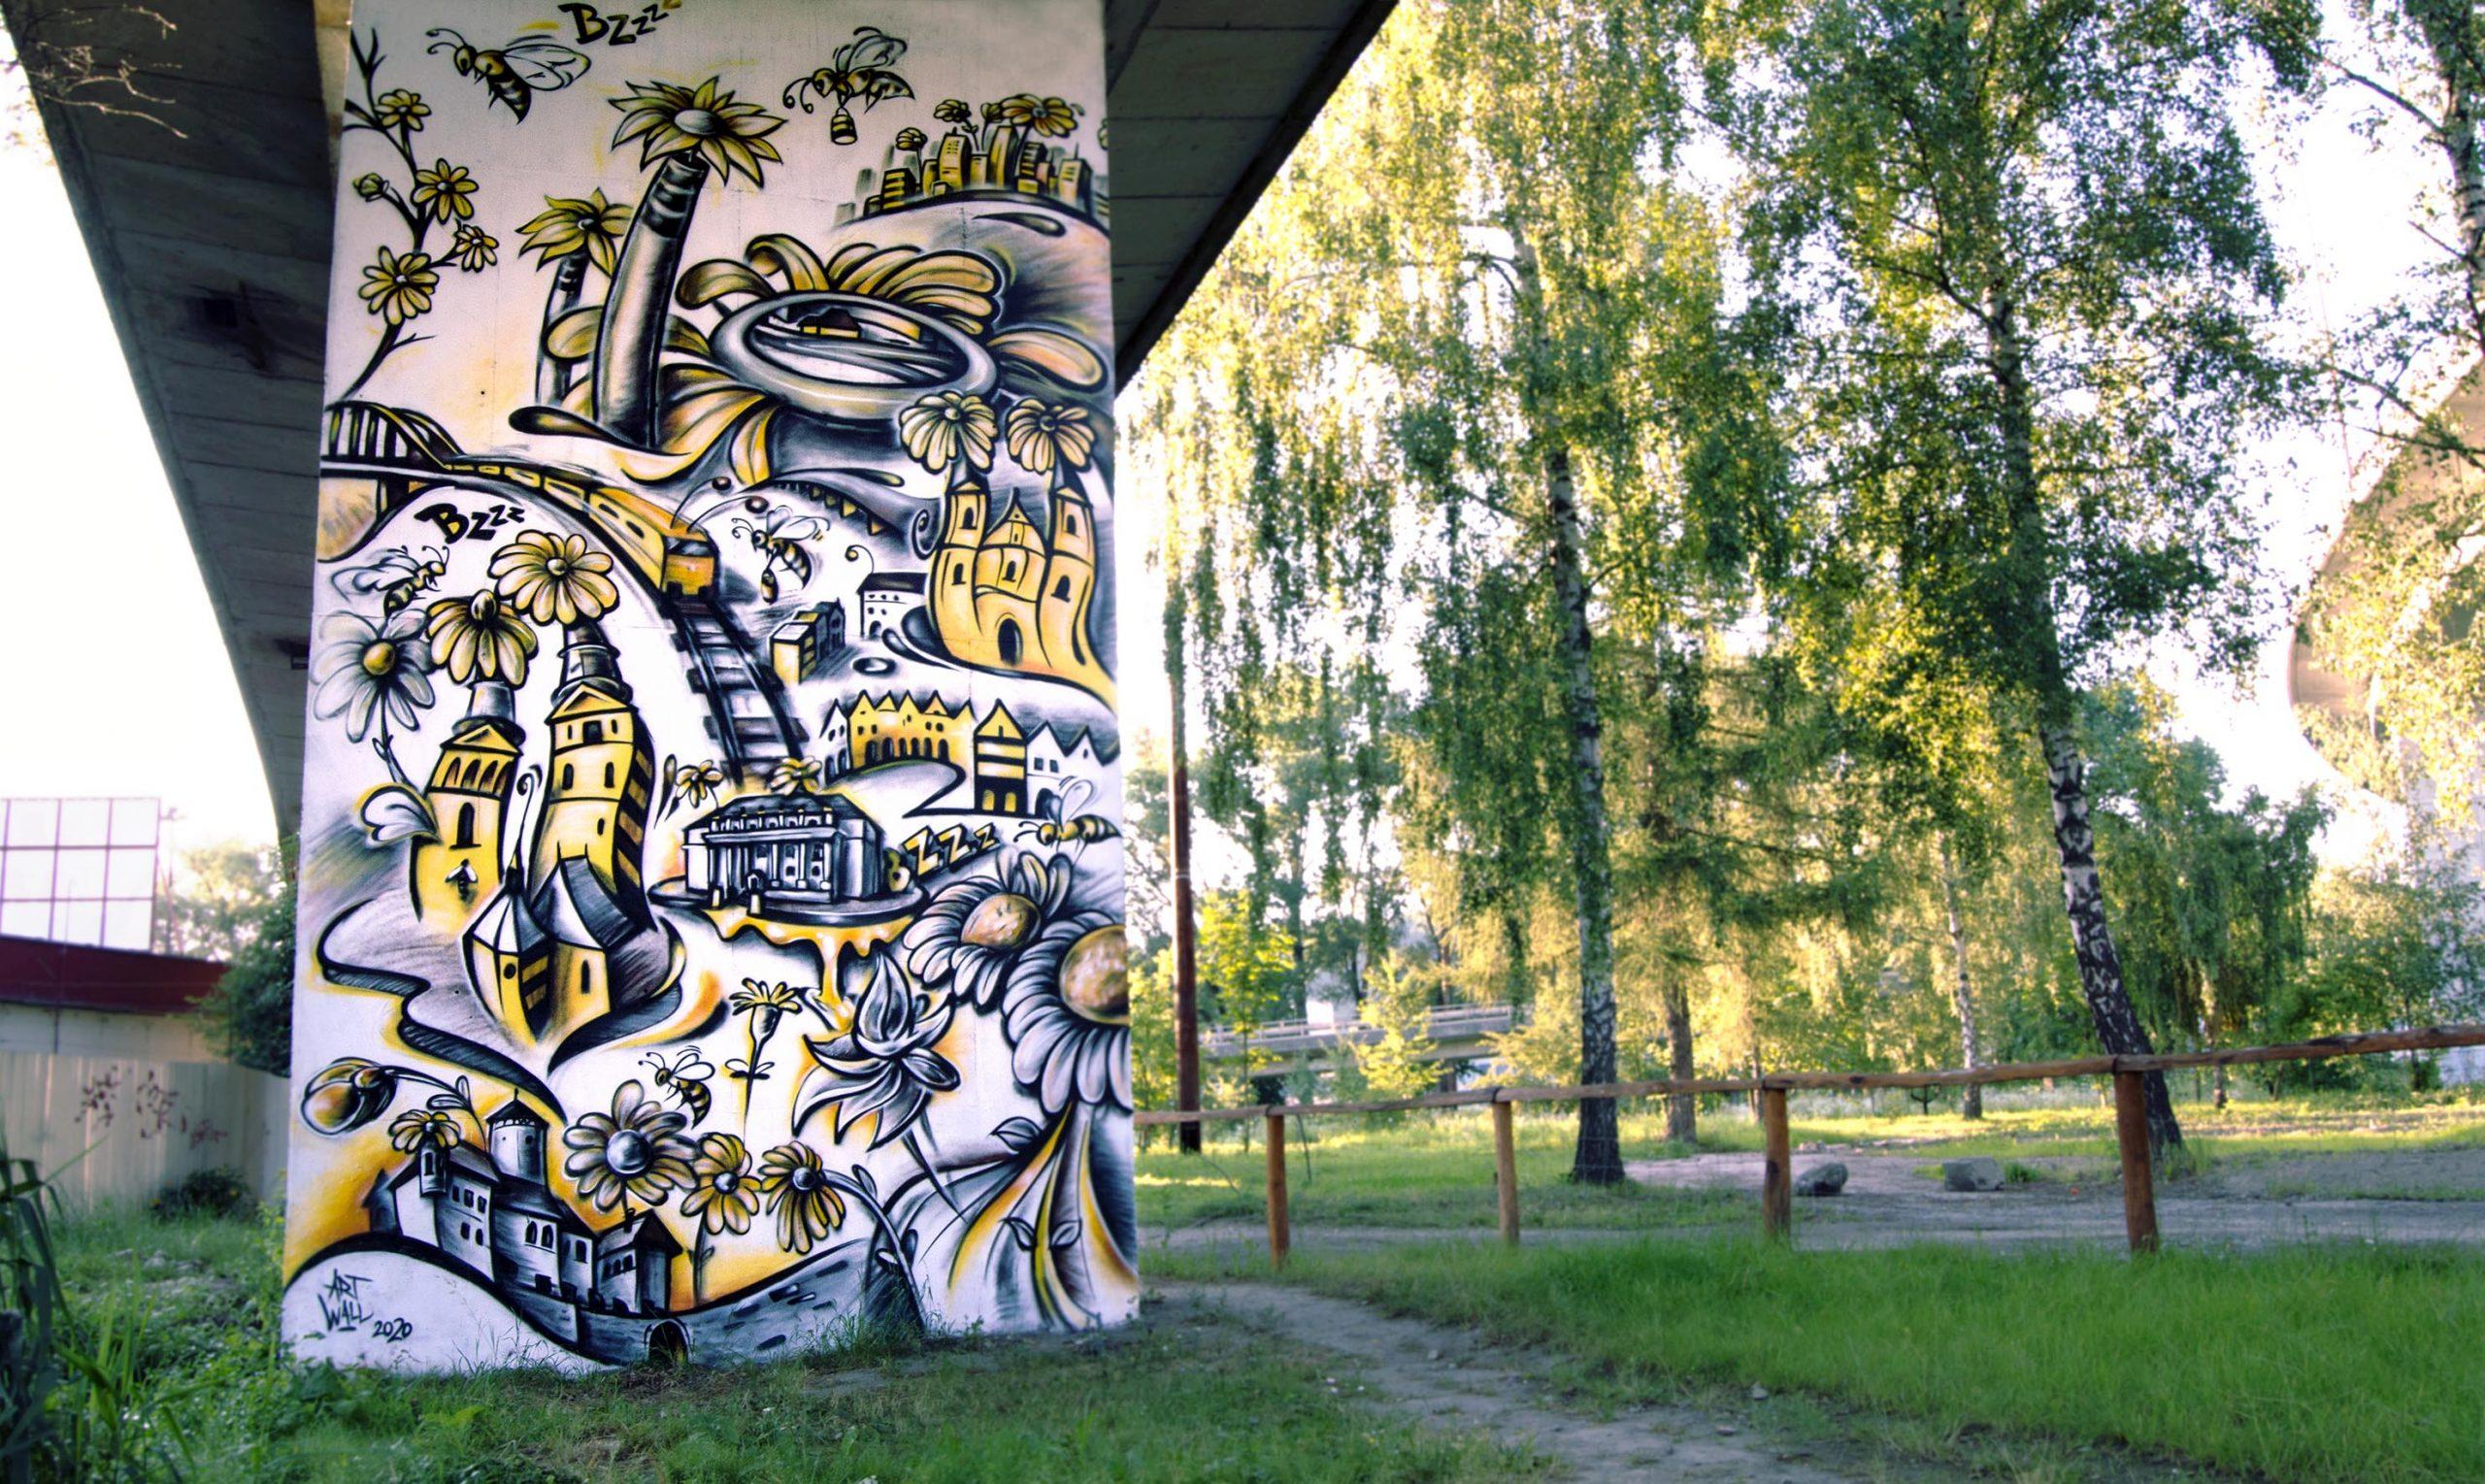 Maľby s ekologickou témou, Žilina 2019 – 2020